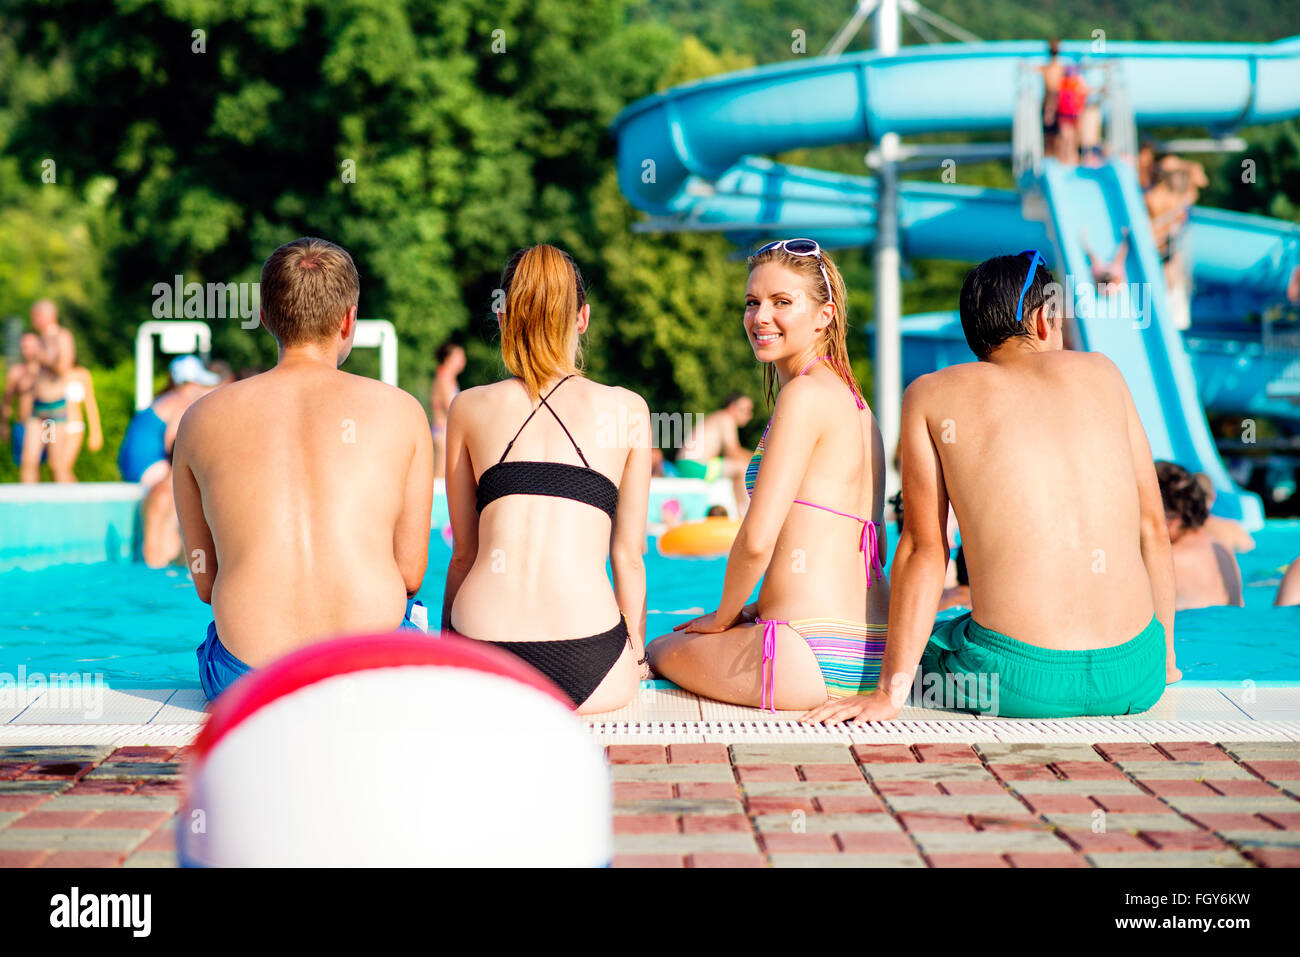 Zwei Paare, Sonnenbaden am Pool. Hitze des Sommers. Stockbild